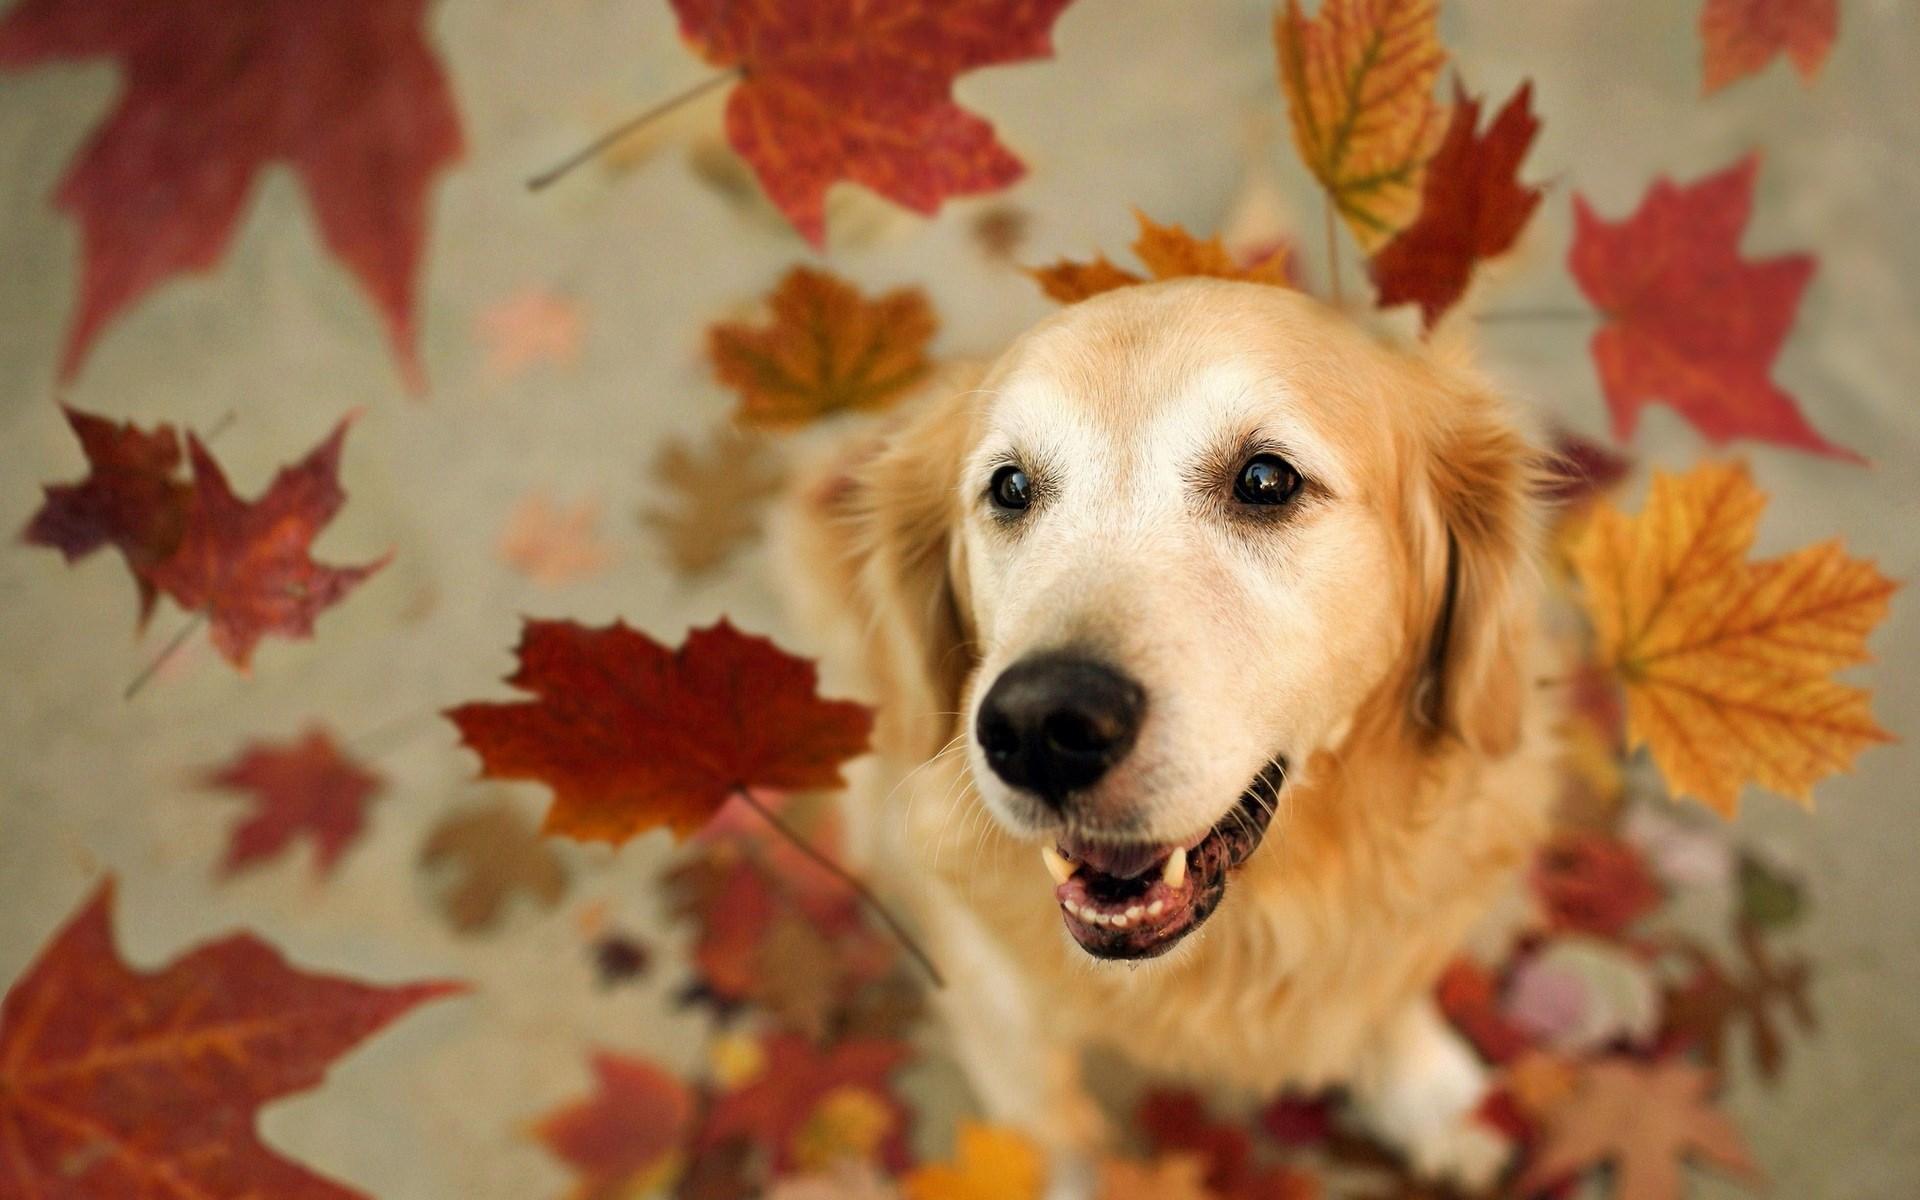 Dog Friend Leaves